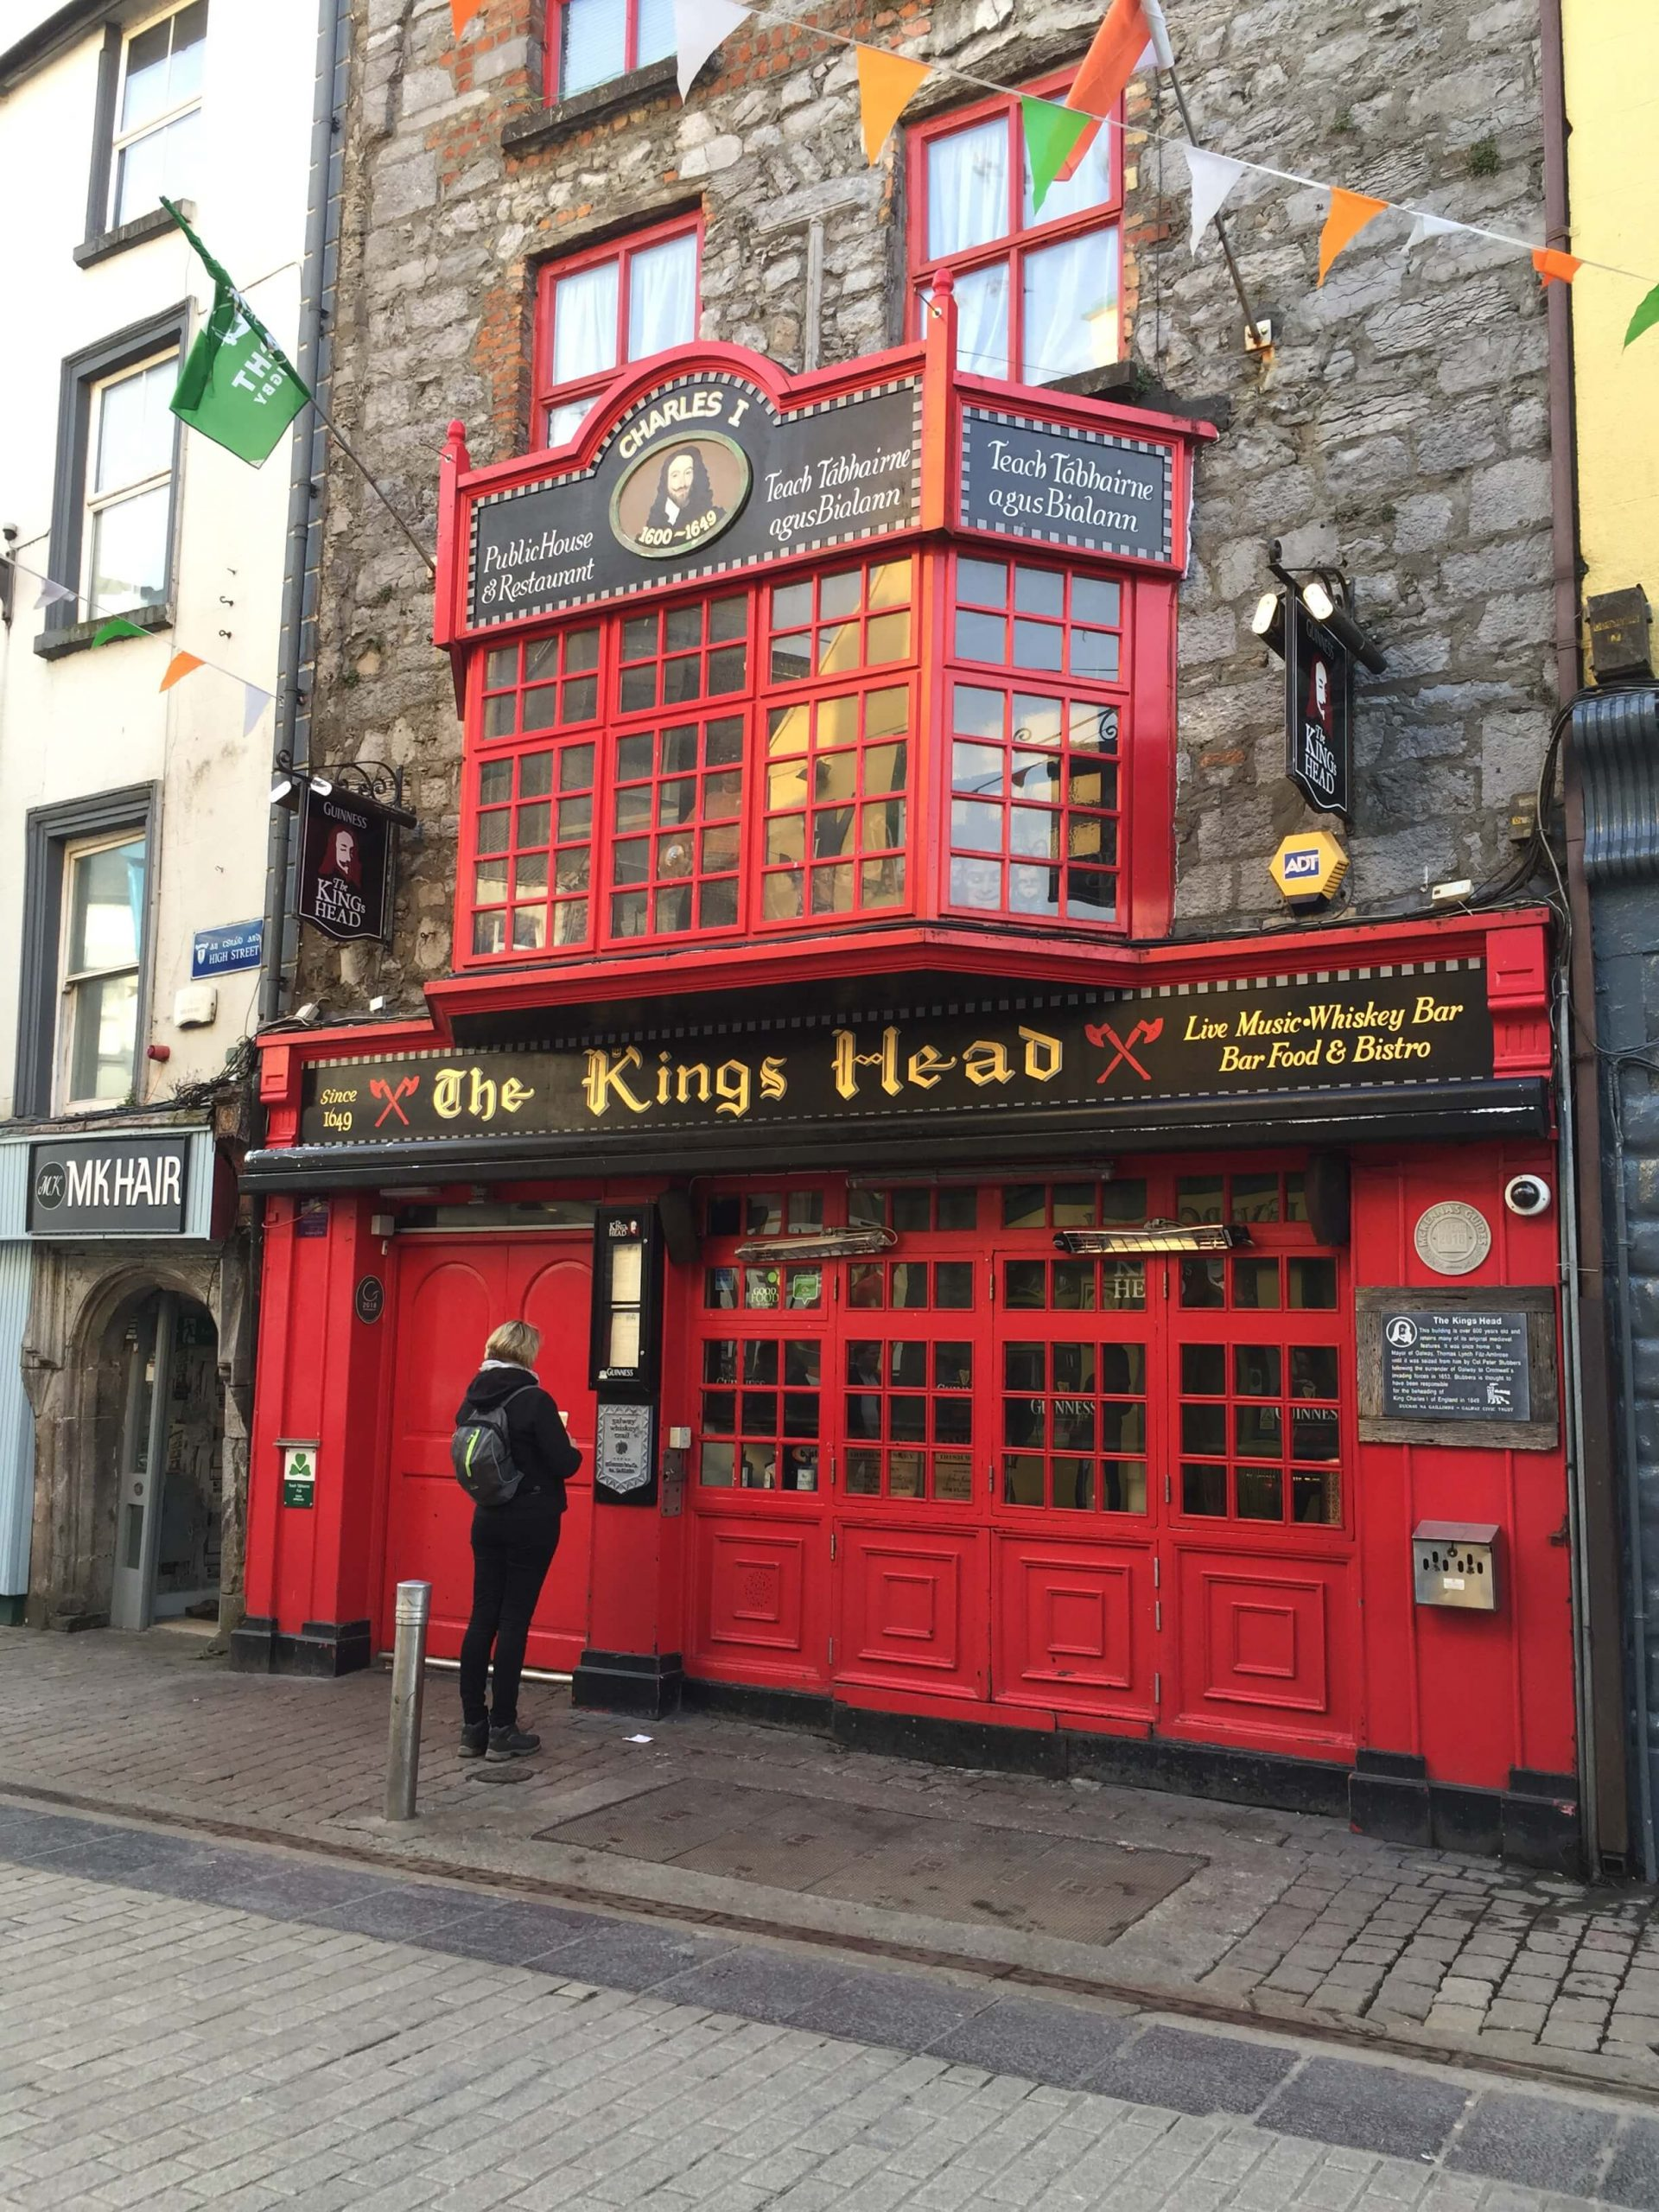 The Kings Head Pub in Galway